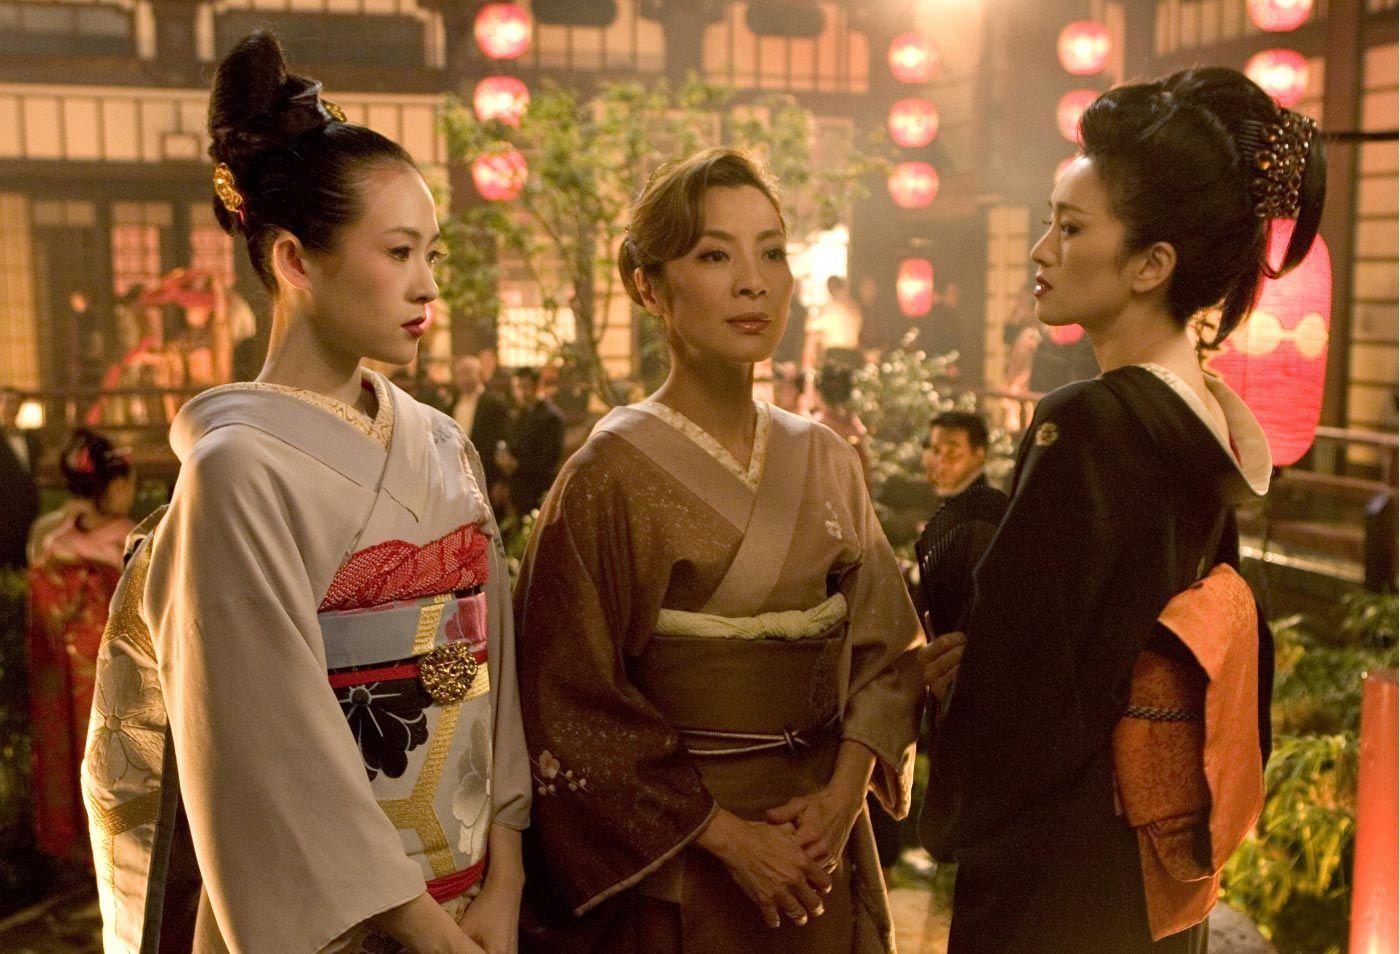 Memoirs Of A Geisha - swornfriendscom